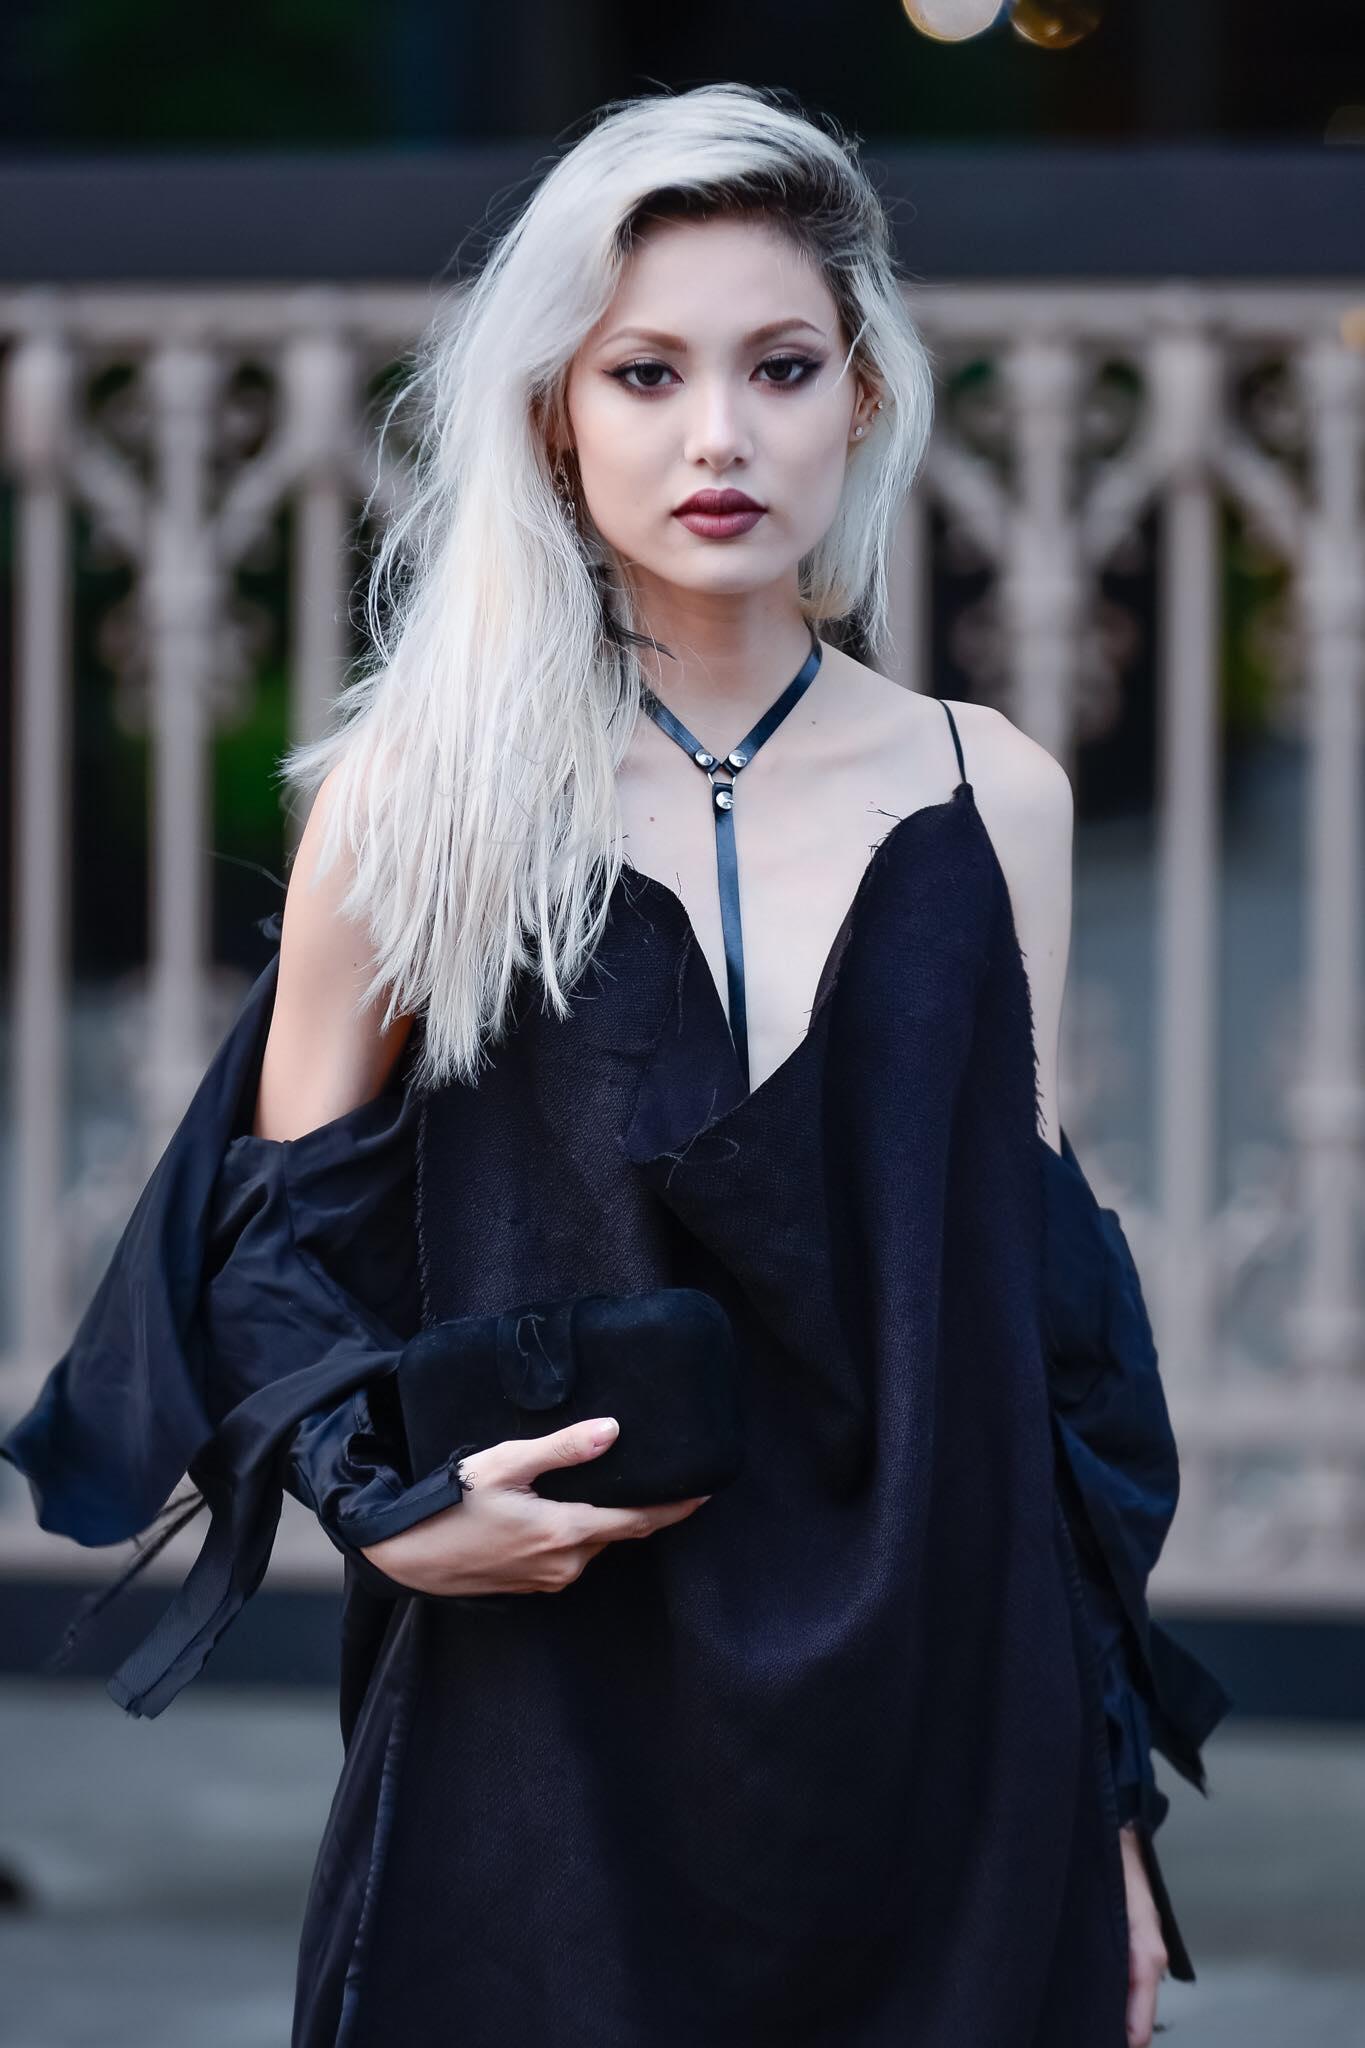 Stree style chuẩn fashionista của hot girl Fung La - 6